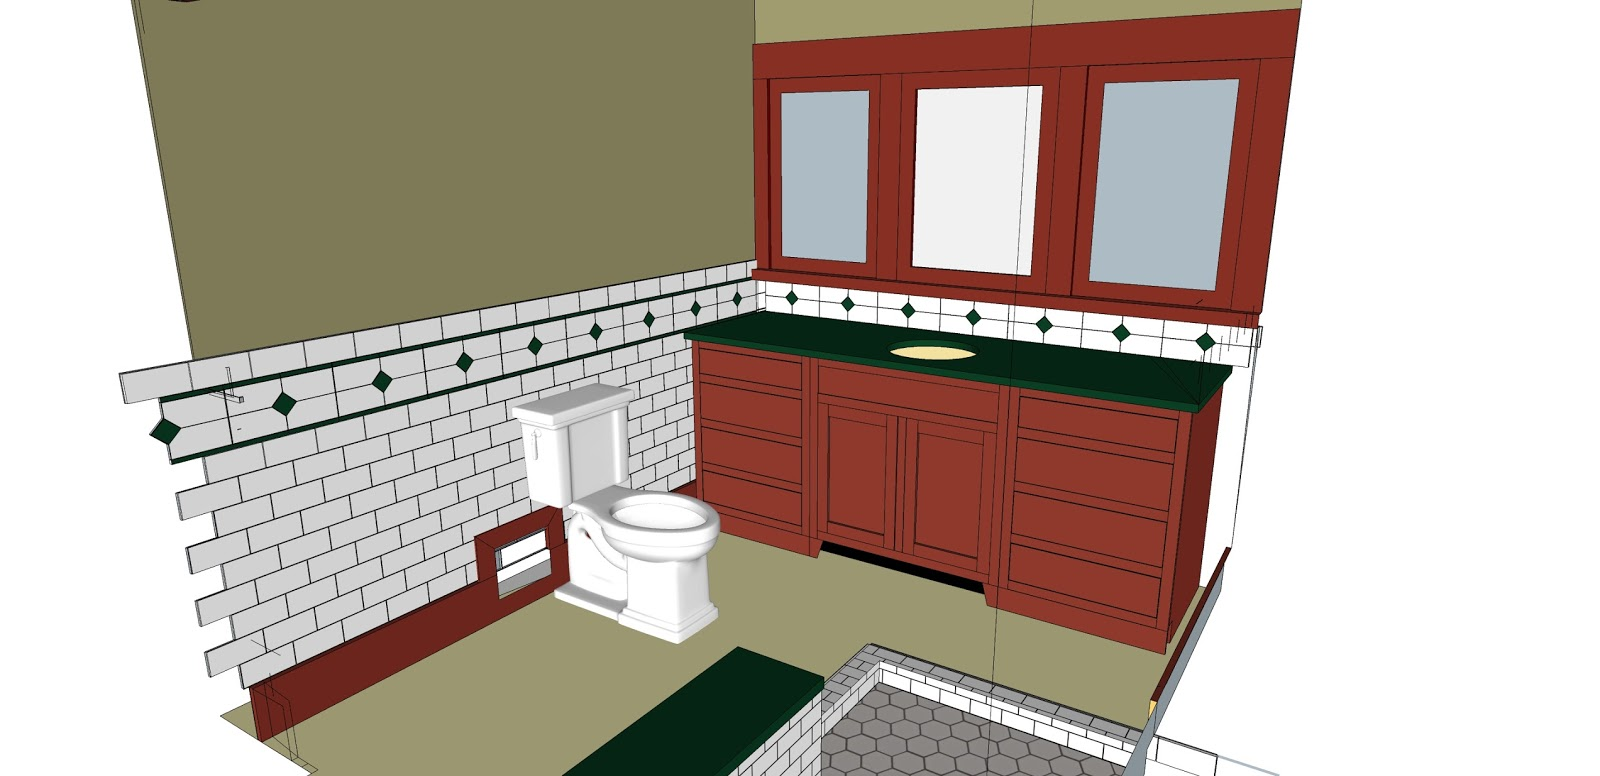 Laurelhurst craftsman bungalow latest bathroom sketchup files for Sketchup bathroom sink